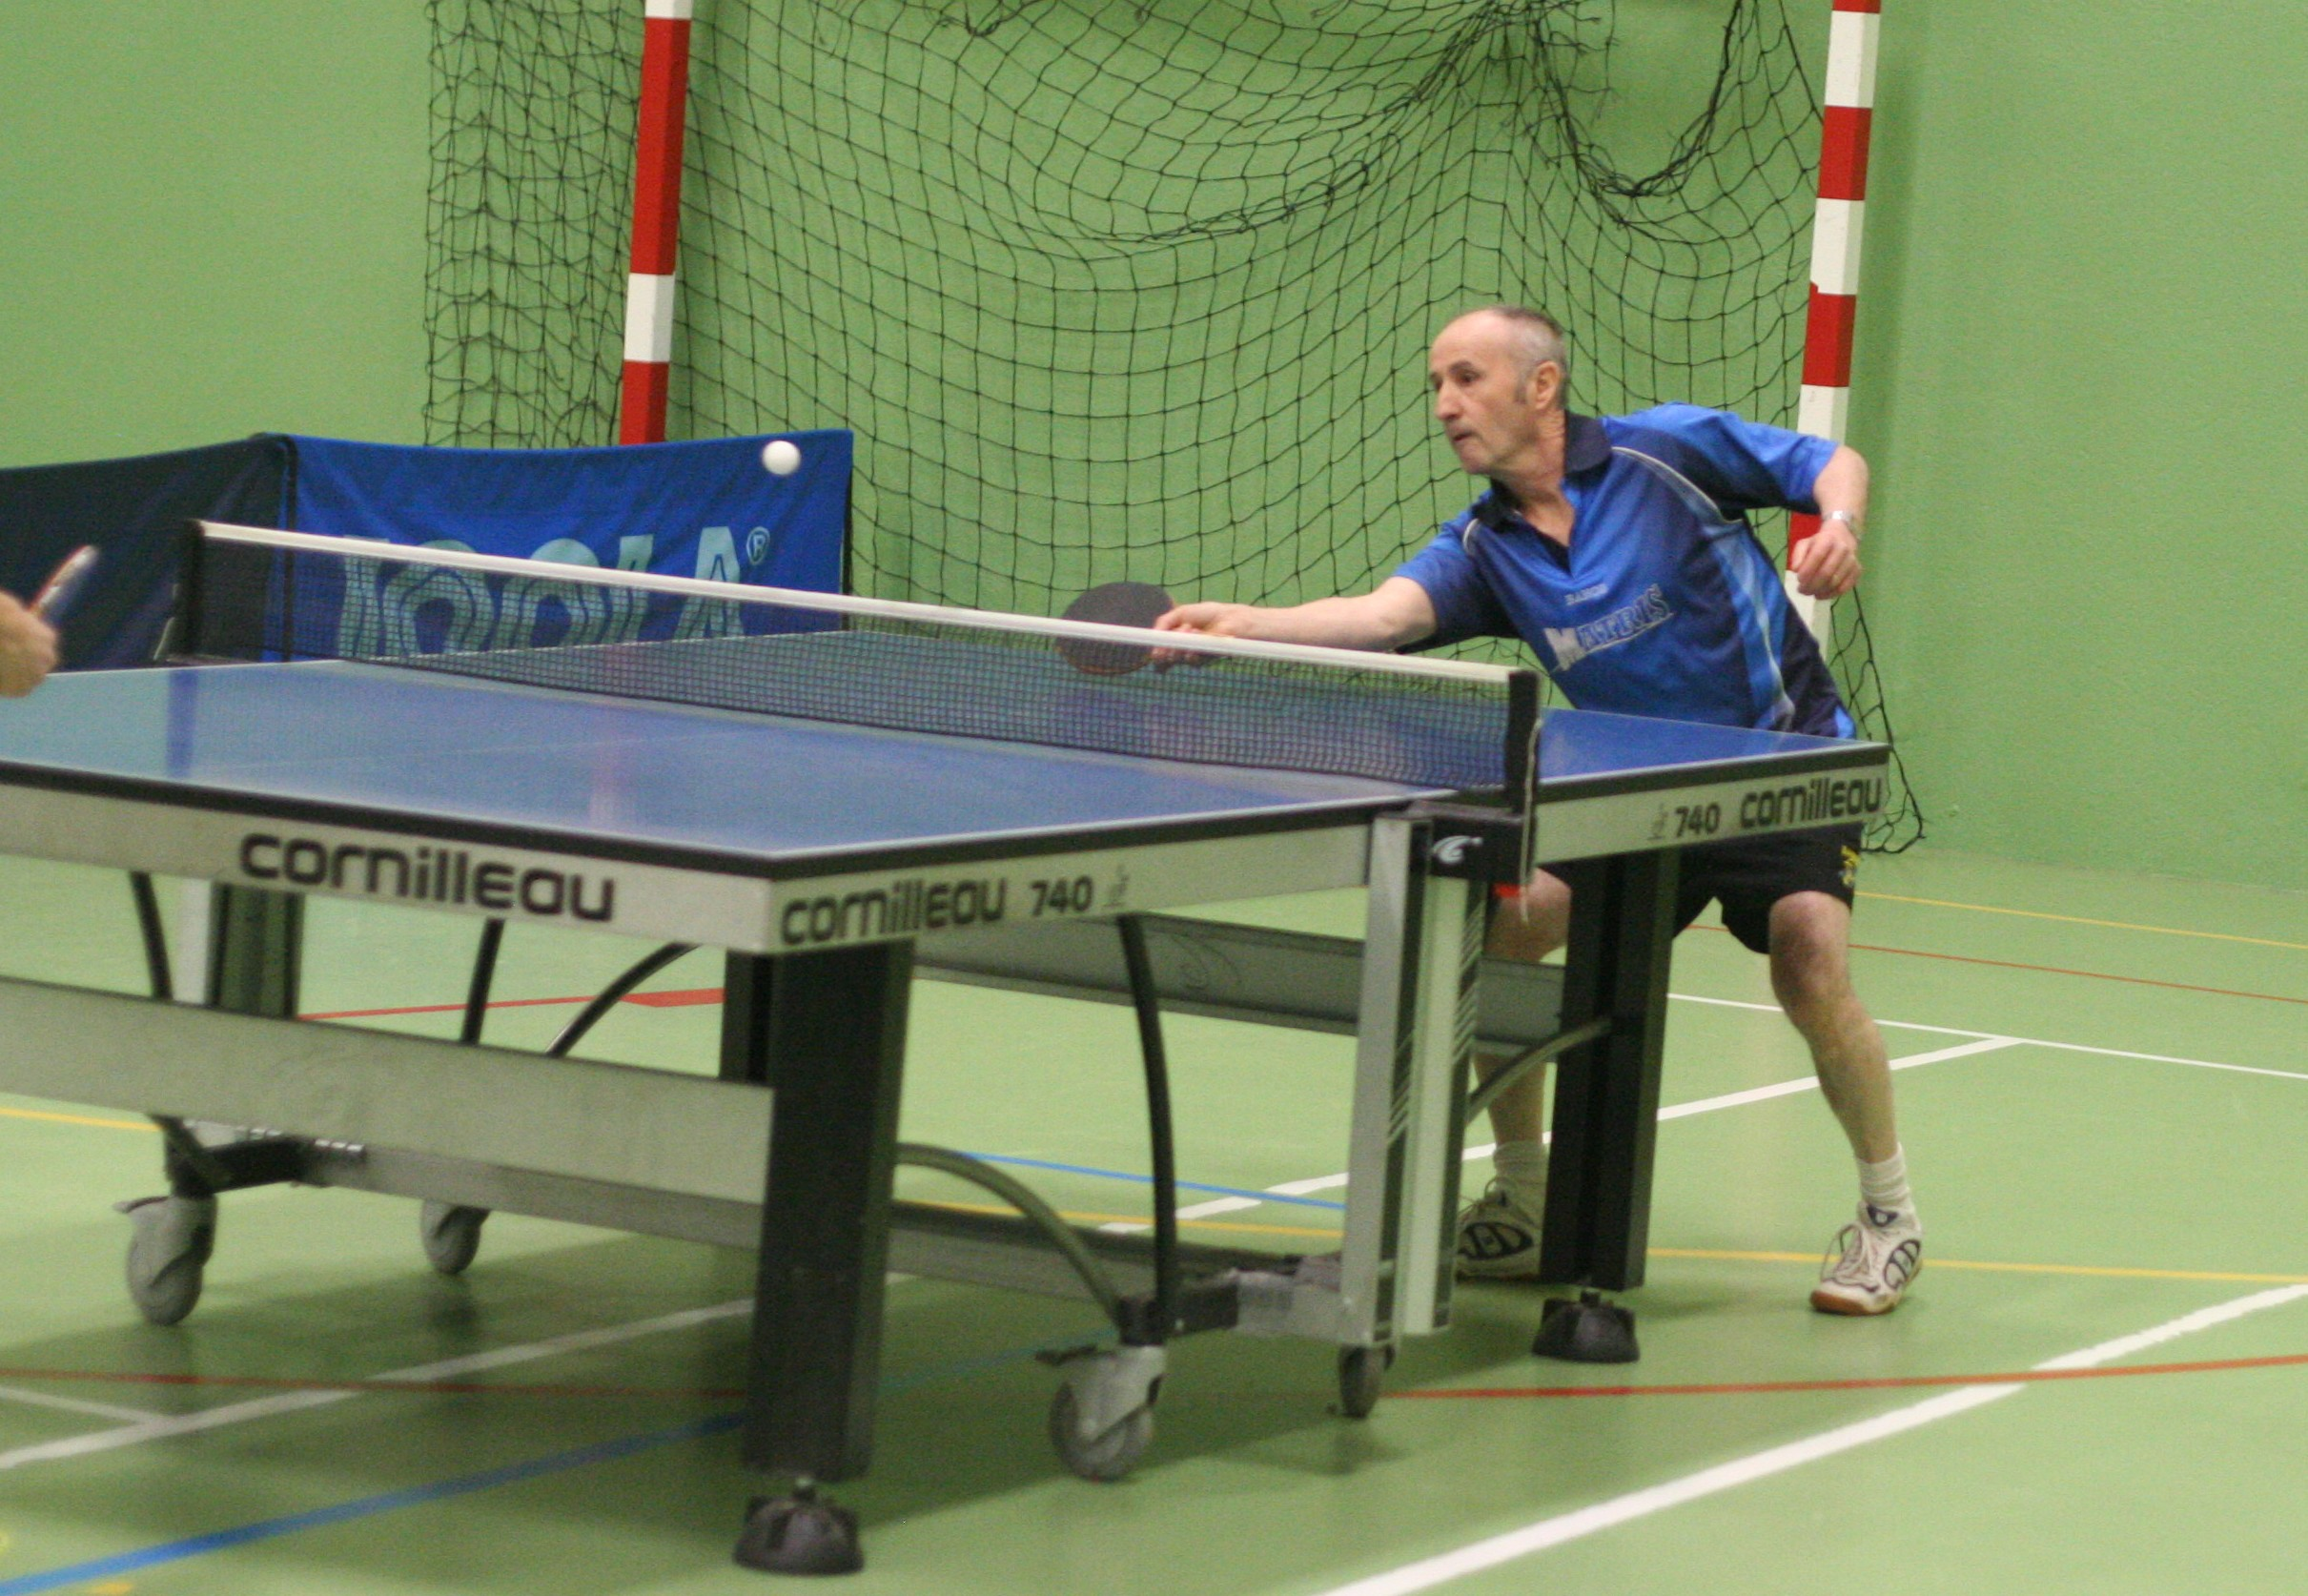 Chagny tennis de table resultats 4eme journ e phase 2 - Resultat tennis de table hainaut ...